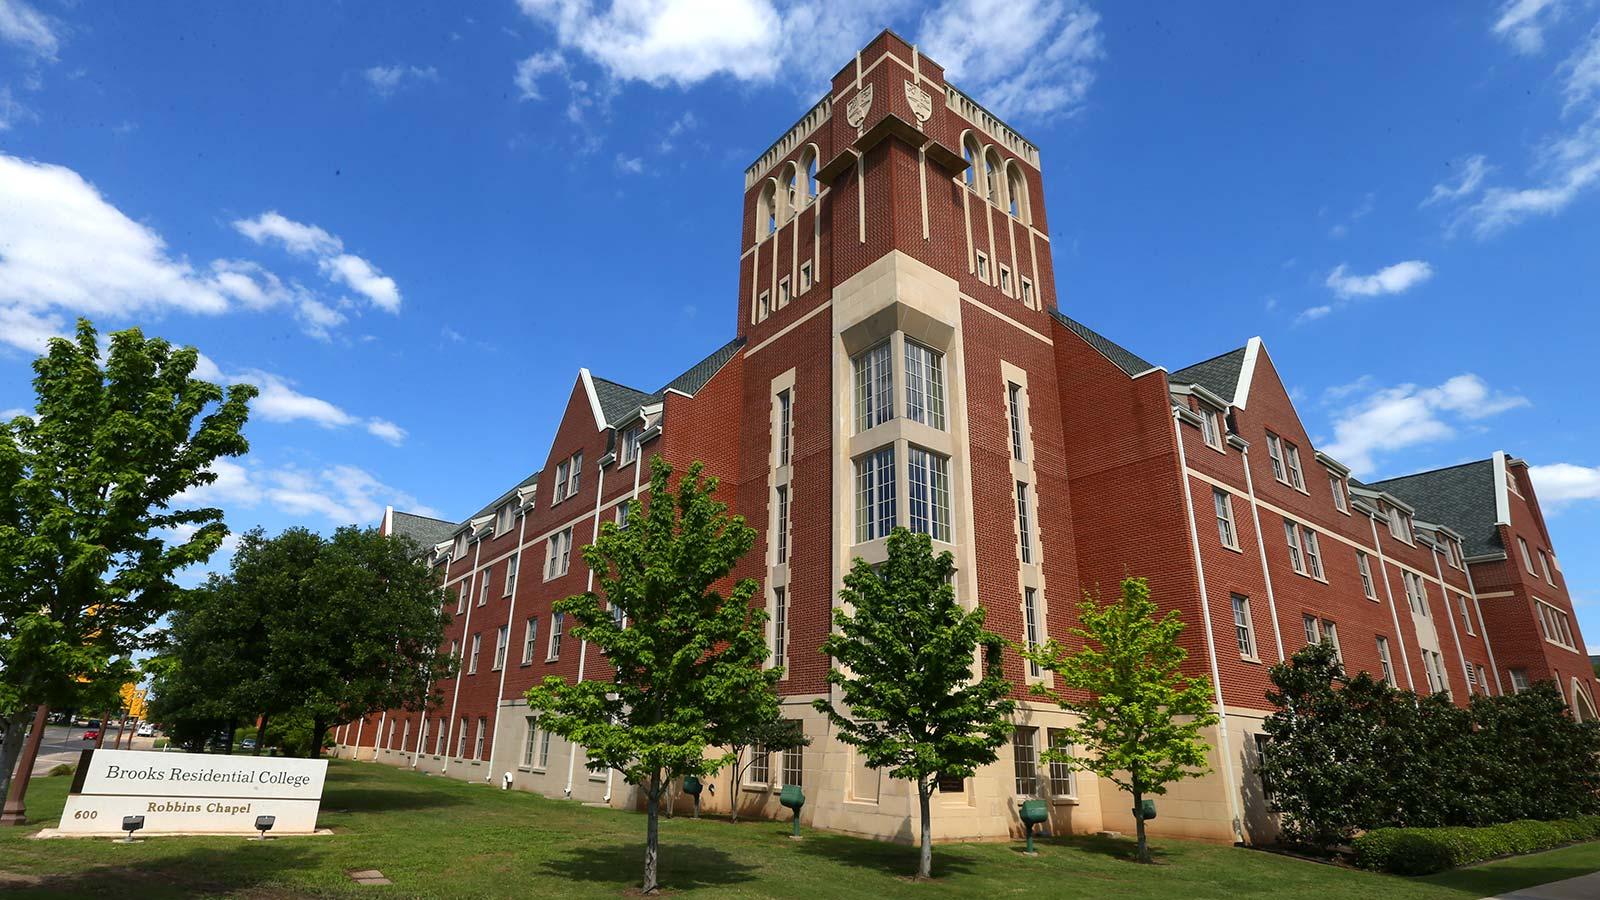 Baylor University (University in Waco, Texas)